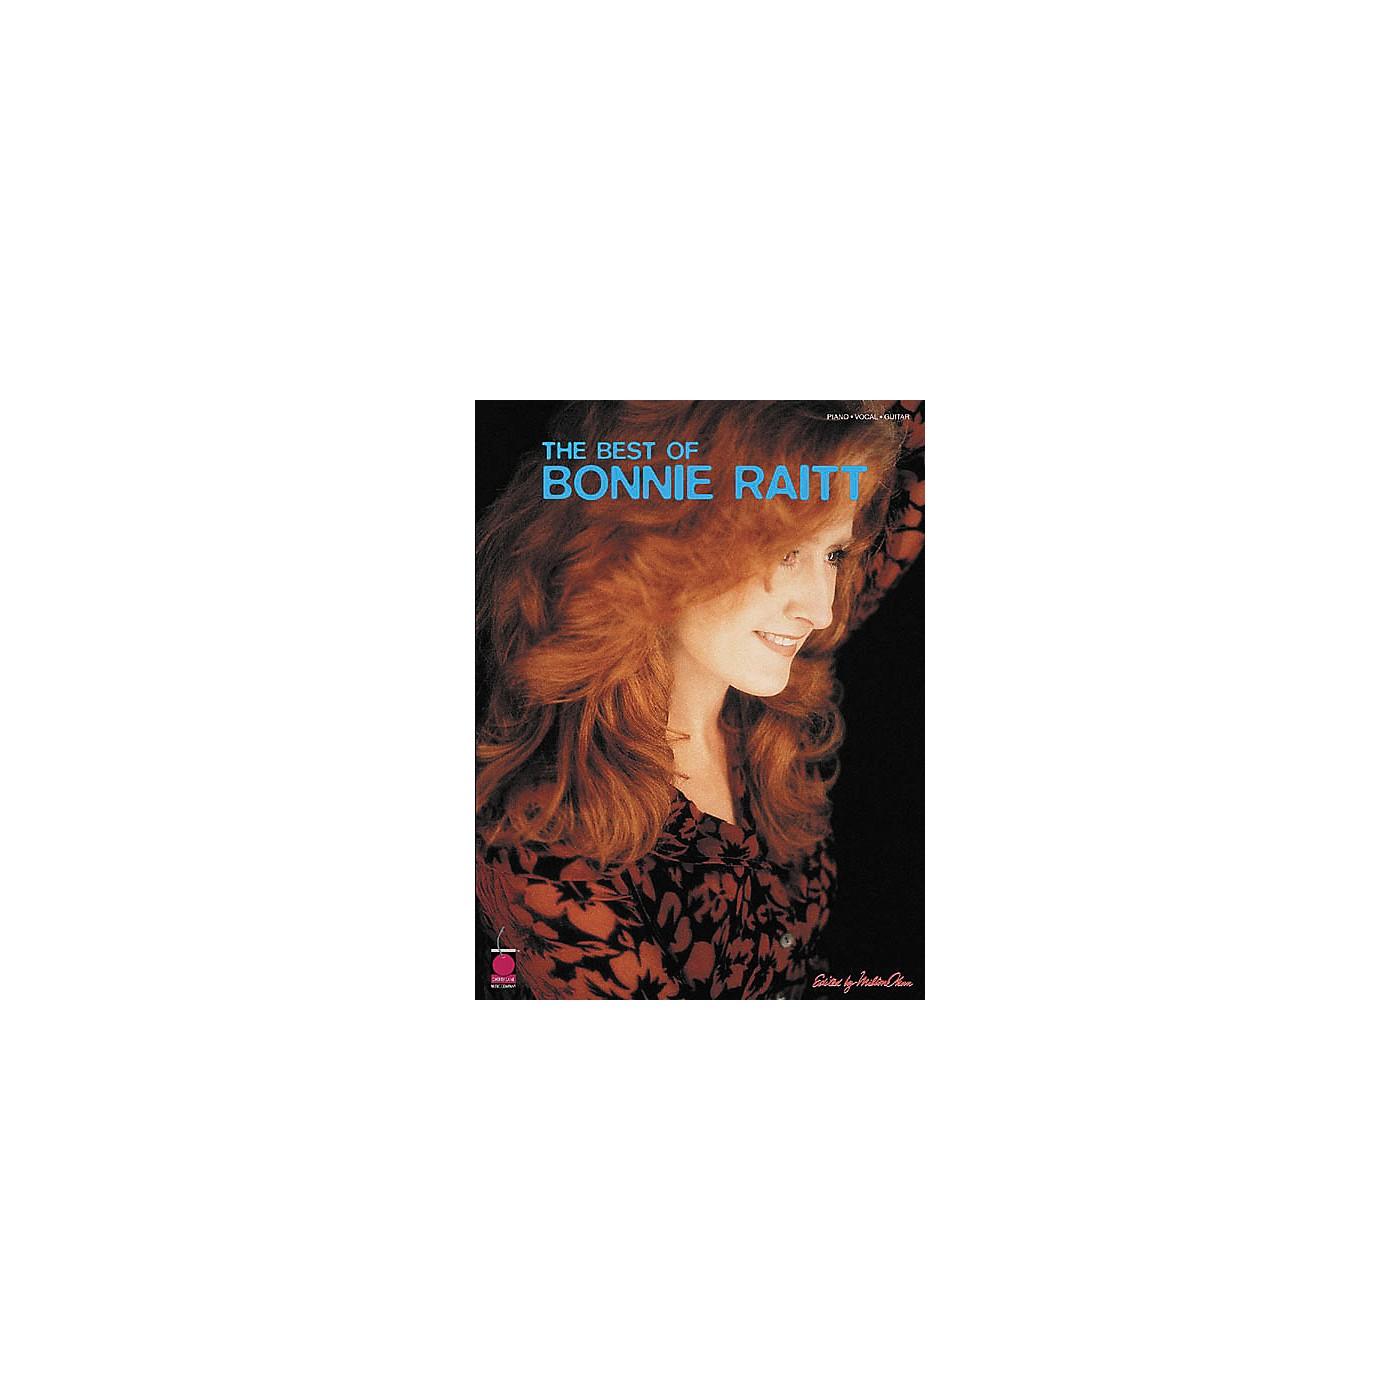 Cherry Lane The Best of Bonnie Raitt Book Piano/Vocal/Guitar Artist Songbook thumbnail